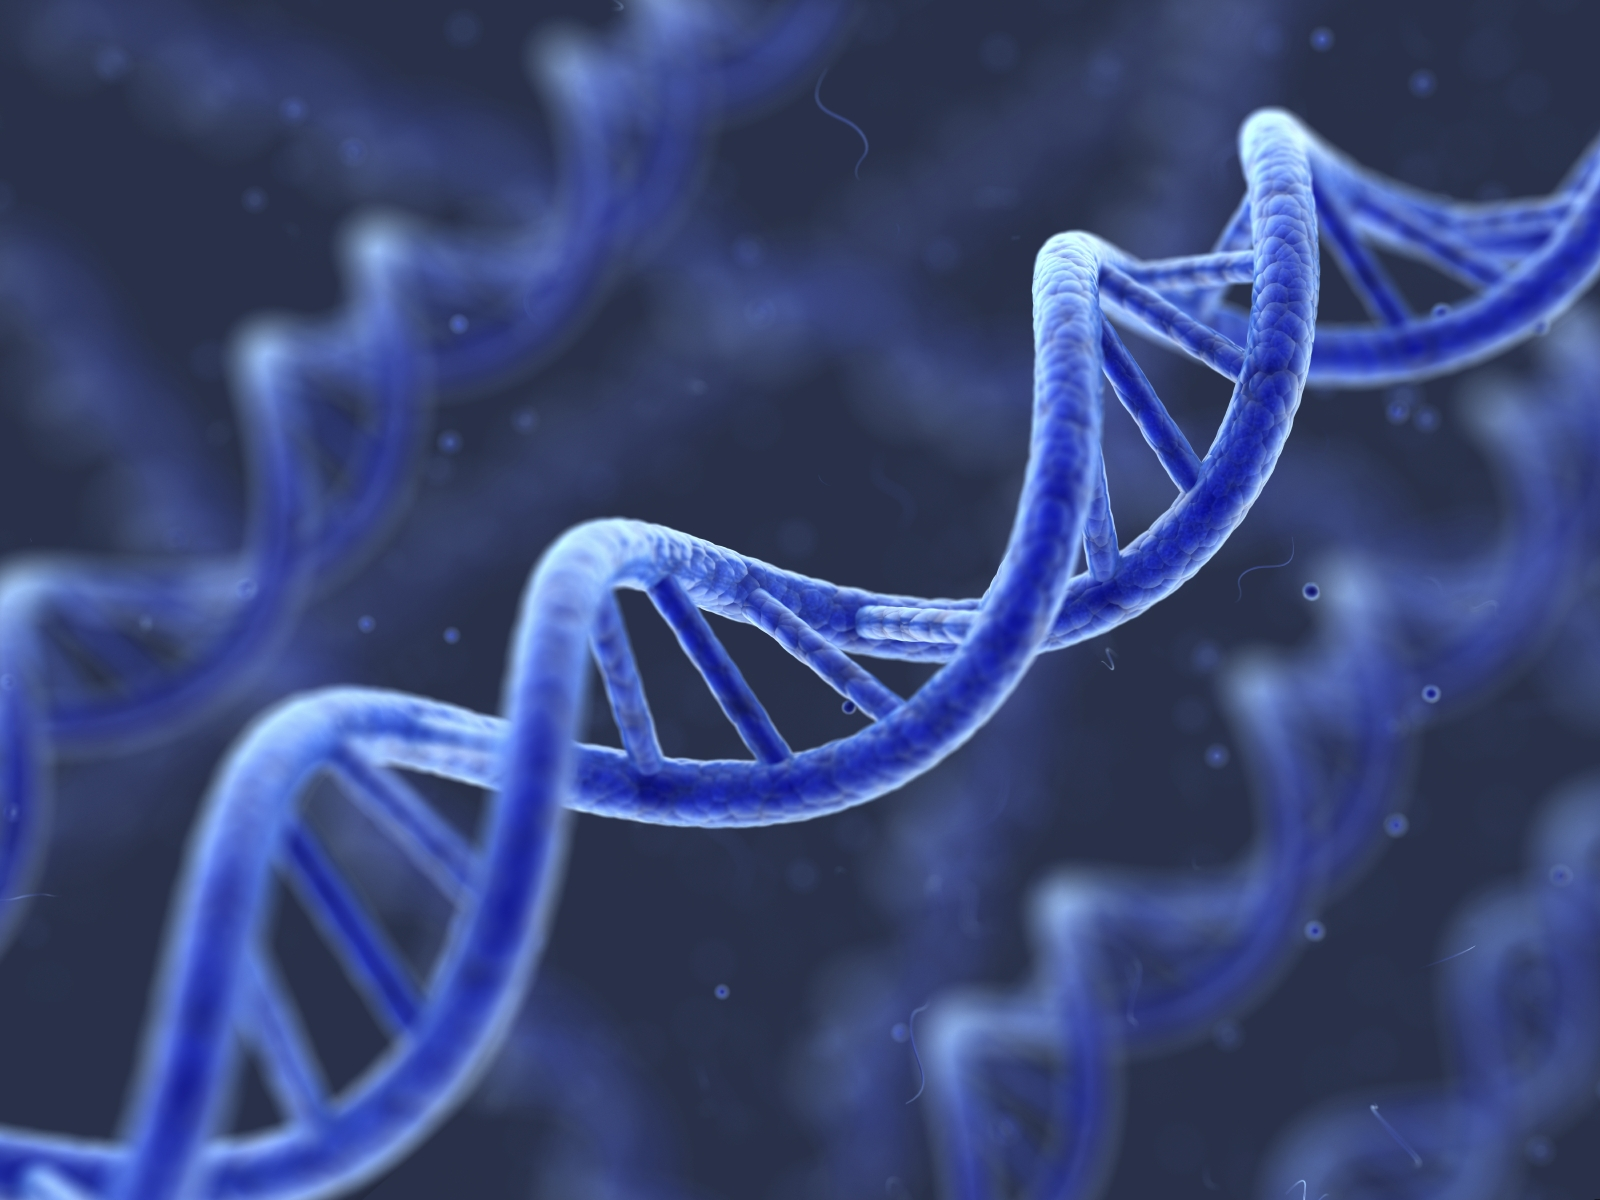 Share DNA